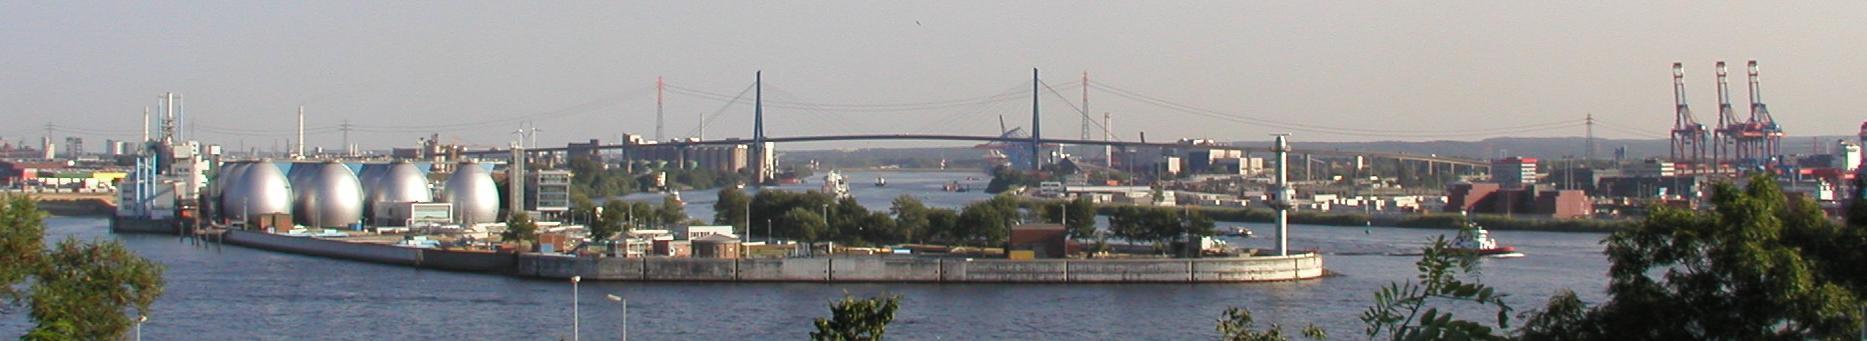 https://de.wikipedia.org/wiki/Hamburger_Hafen